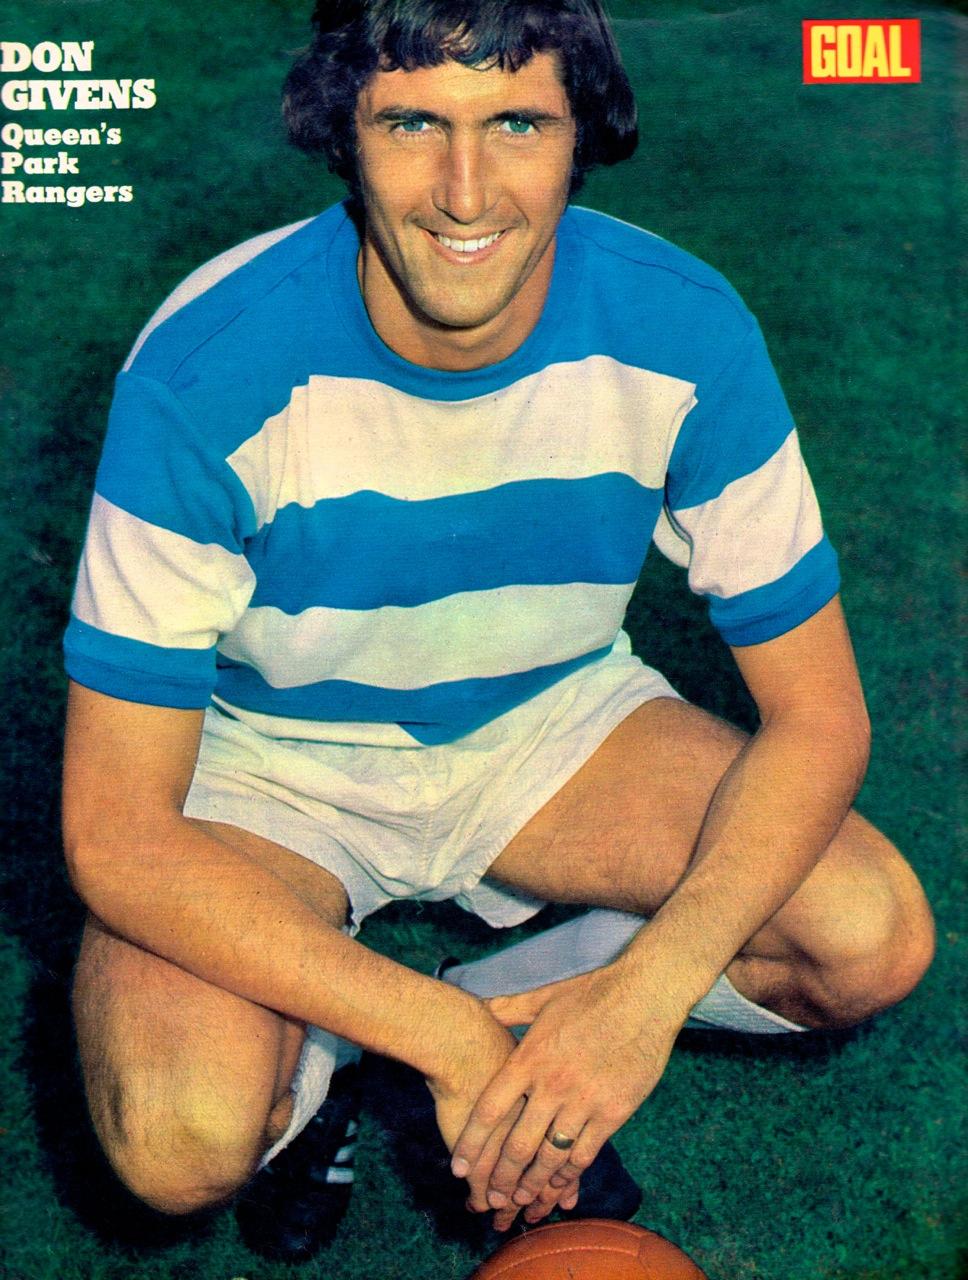 Don Givens, QPR 1972